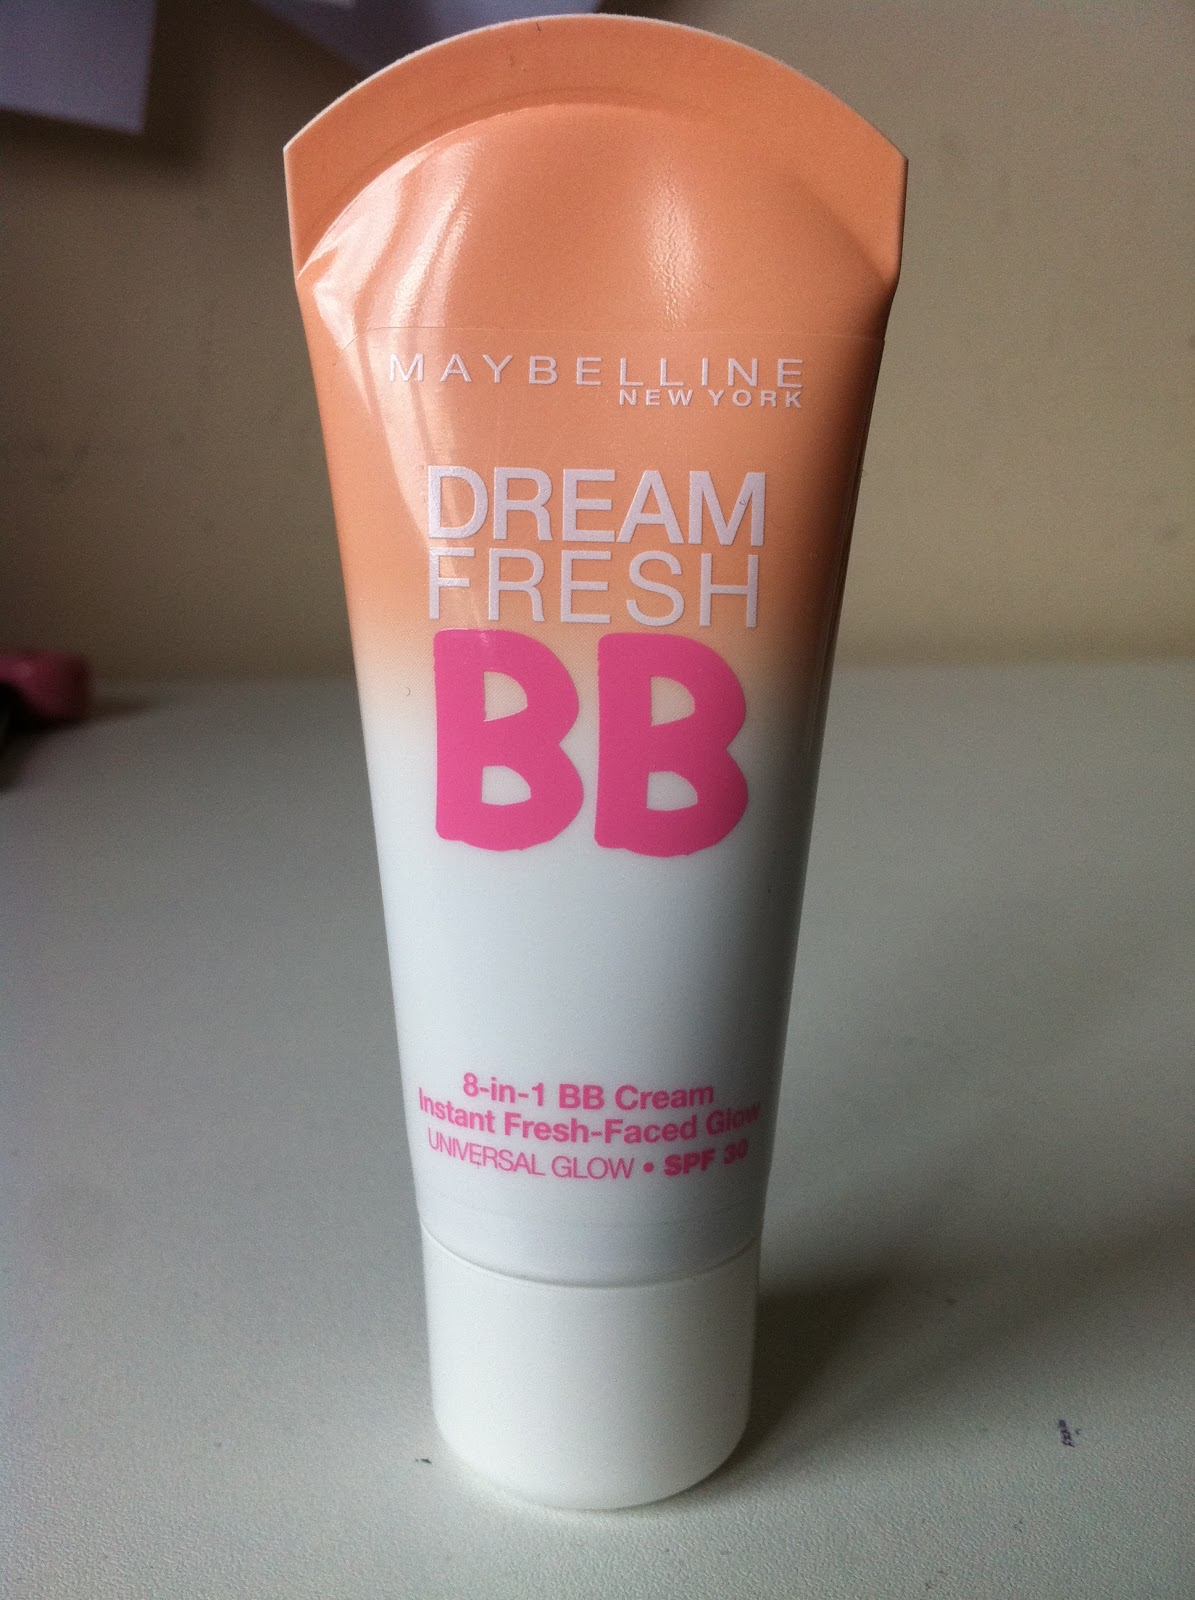 Maybelline Dream Fresh BB Cream  MakeUp  Pinterest  Bb creams